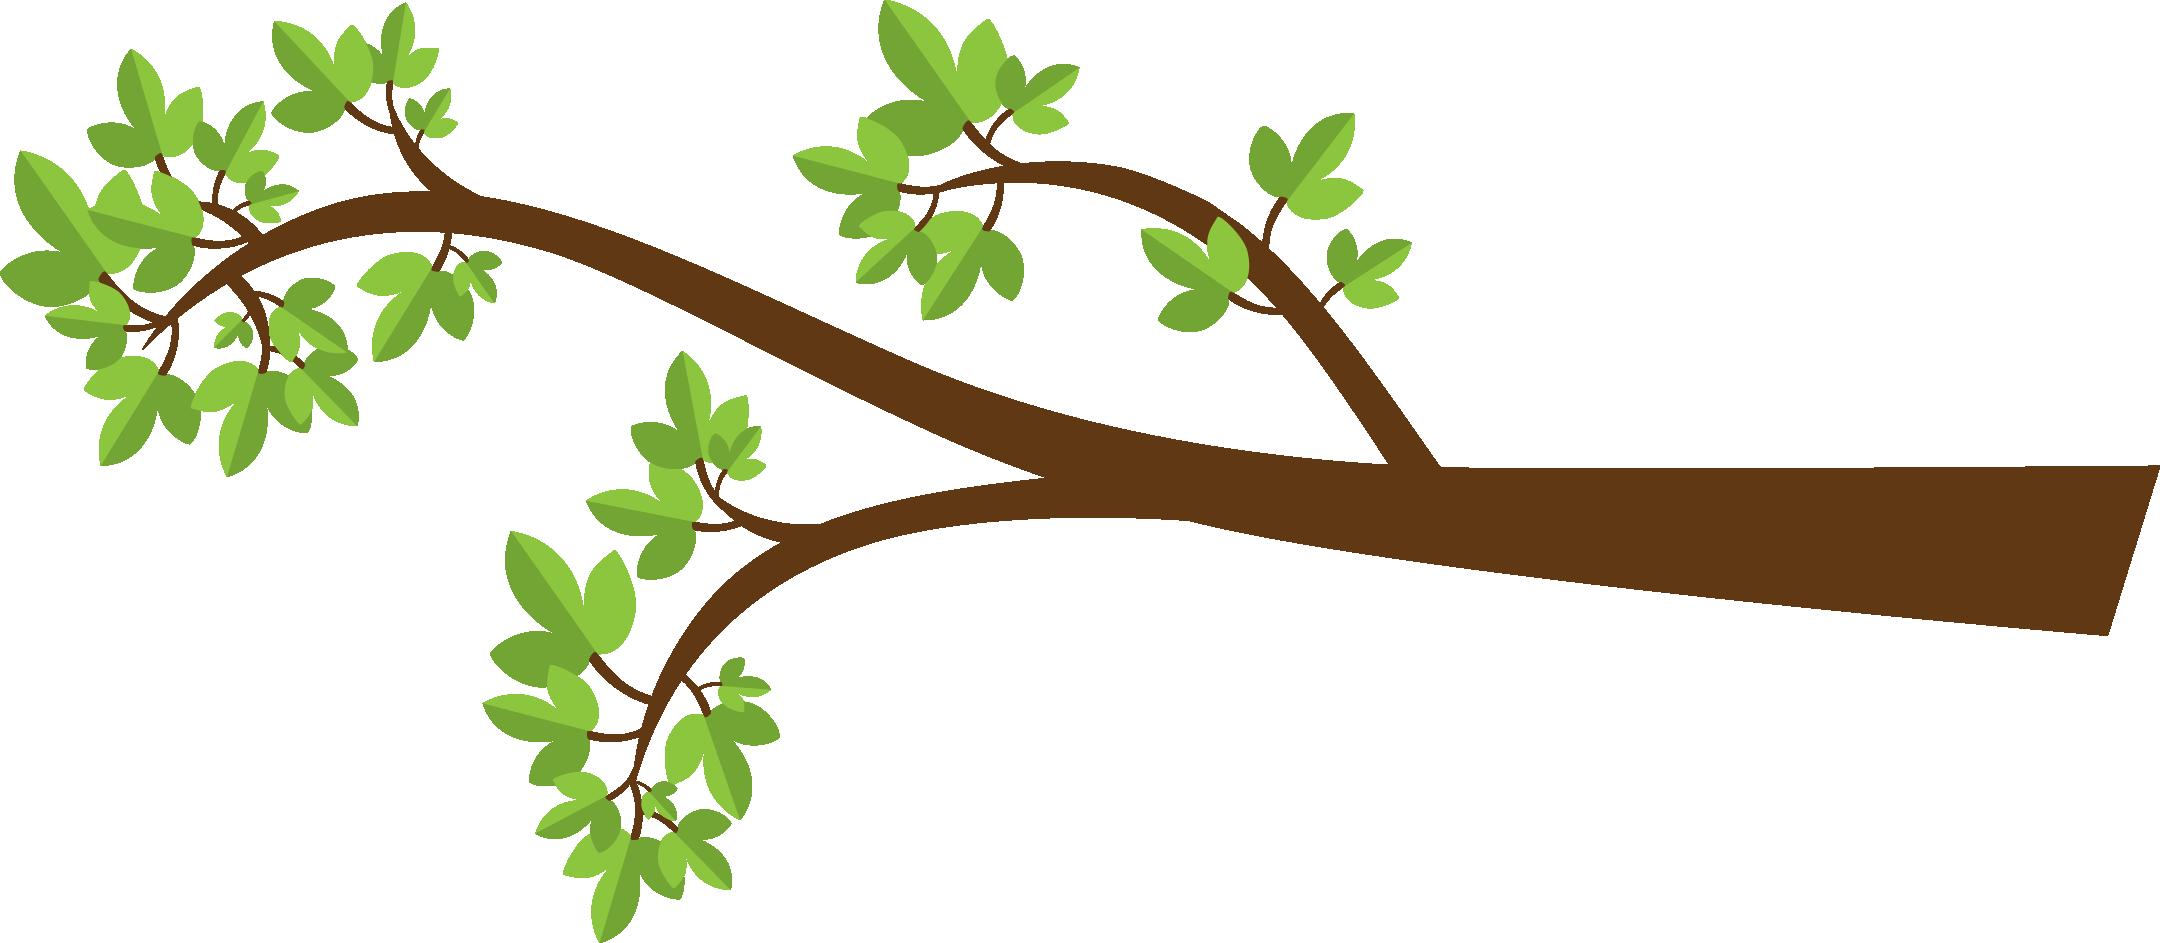 Apple tree branch clipart jpg download Winter Tree Branches Clip Art jpg download